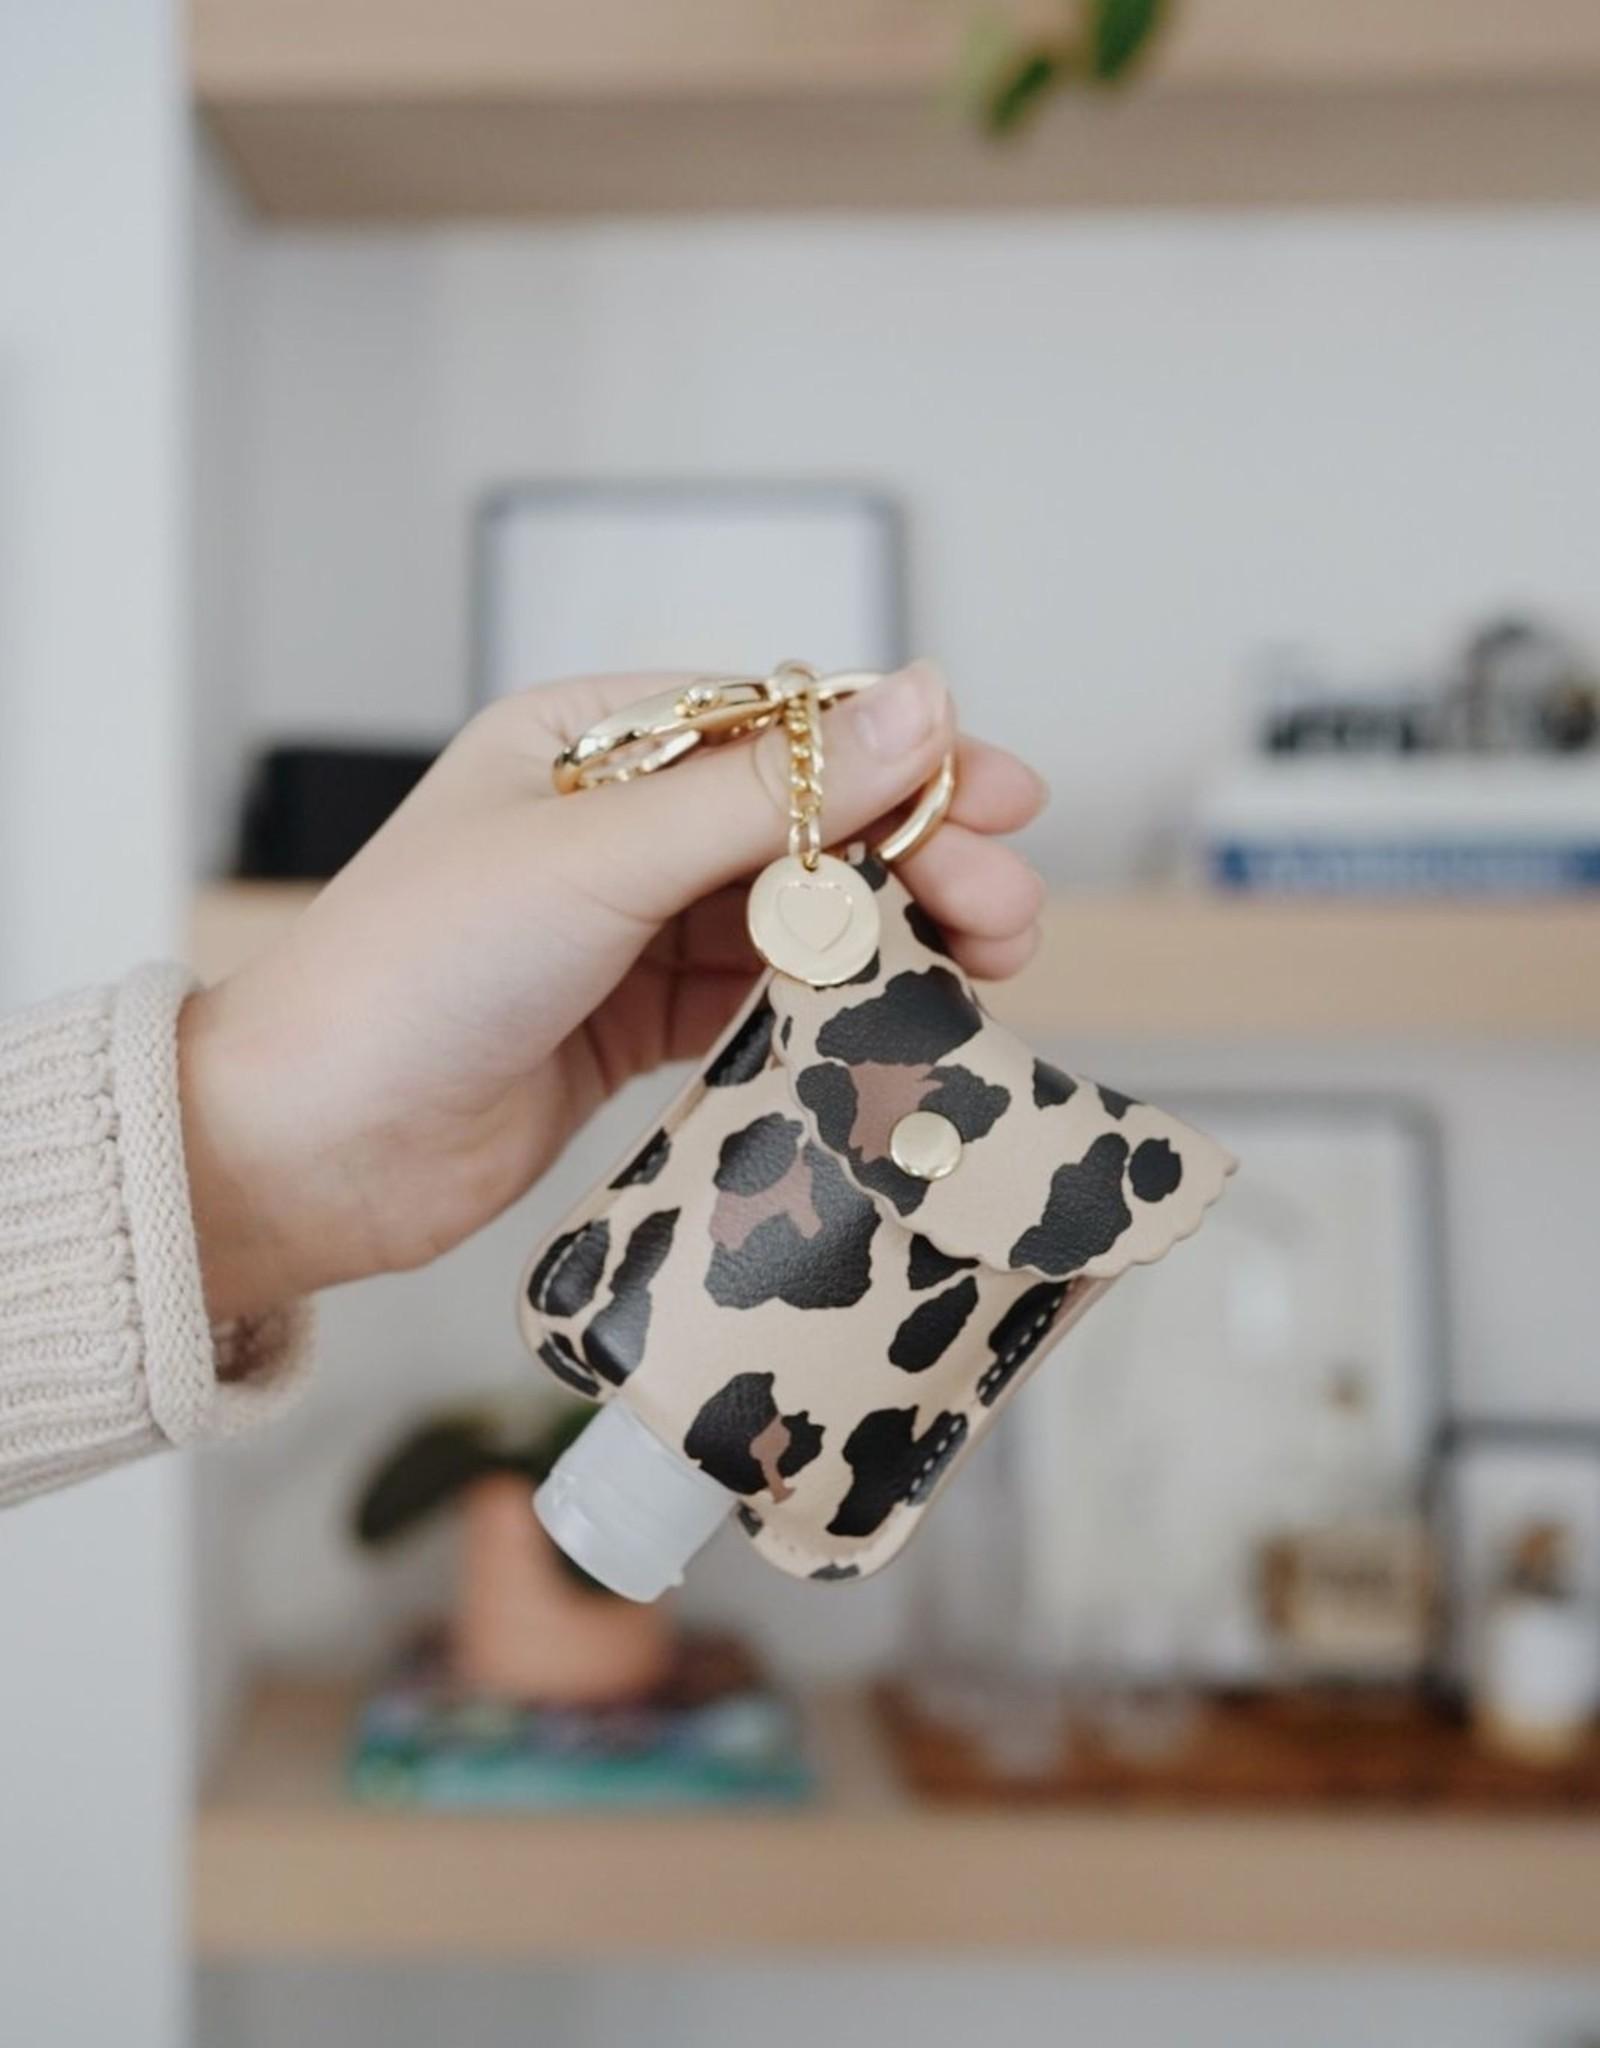 Itzy Ritzy Cute 'n Clean Hand Sanitizer Keychain - Leopard